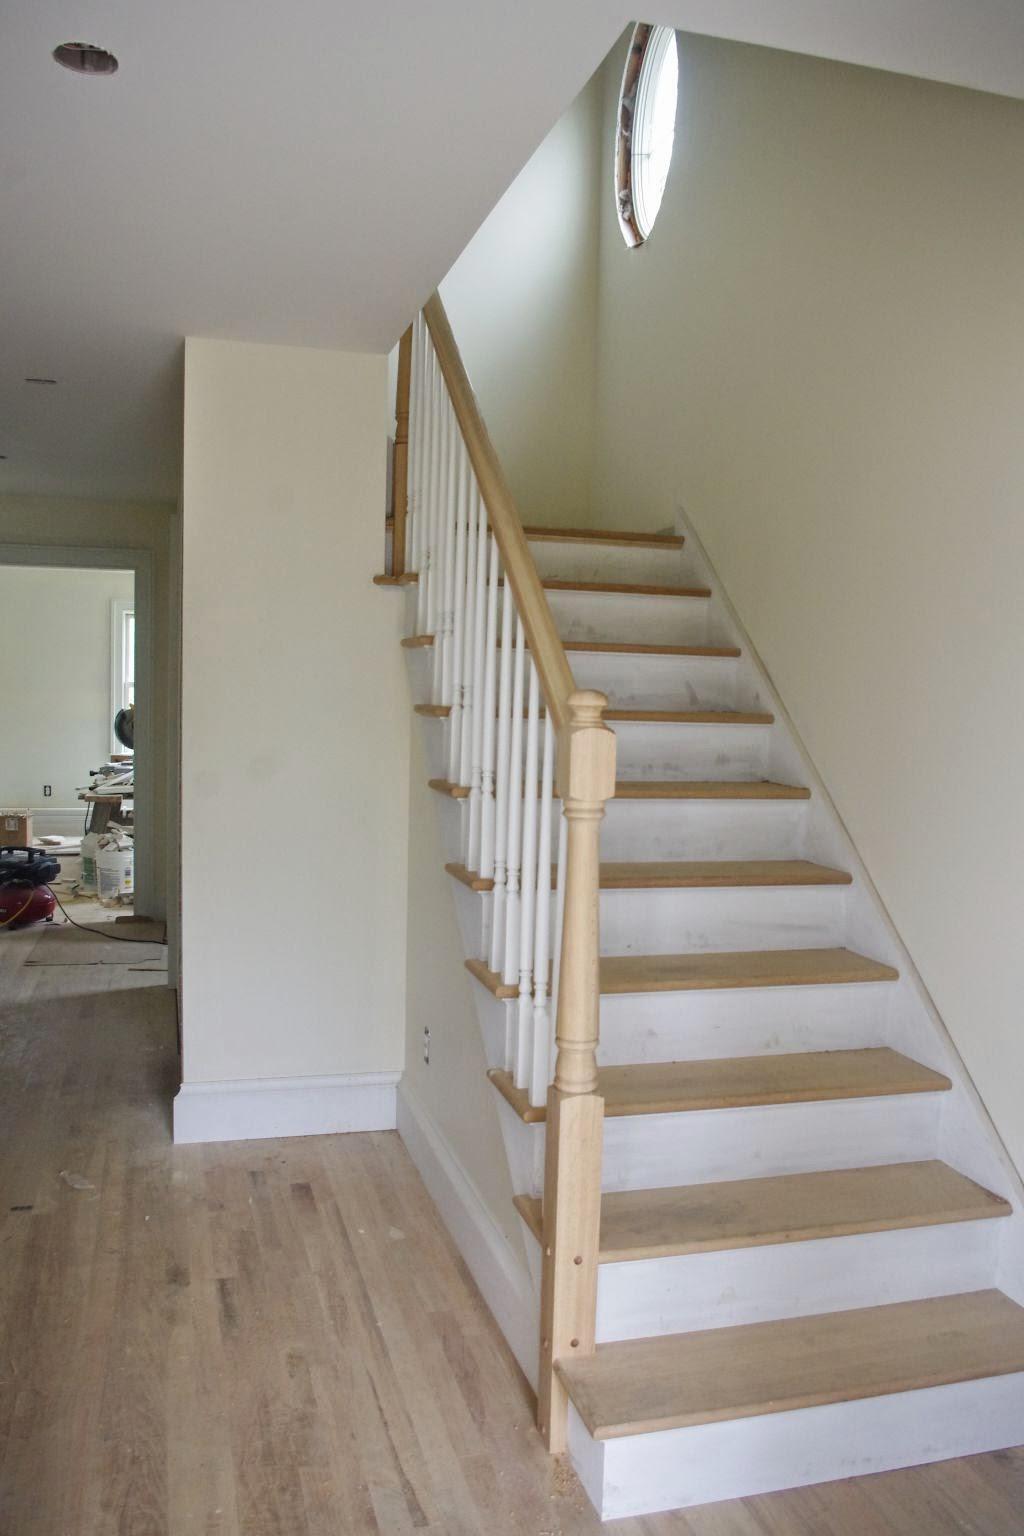 Under Stairs Closet Door Stair Railing And Closet